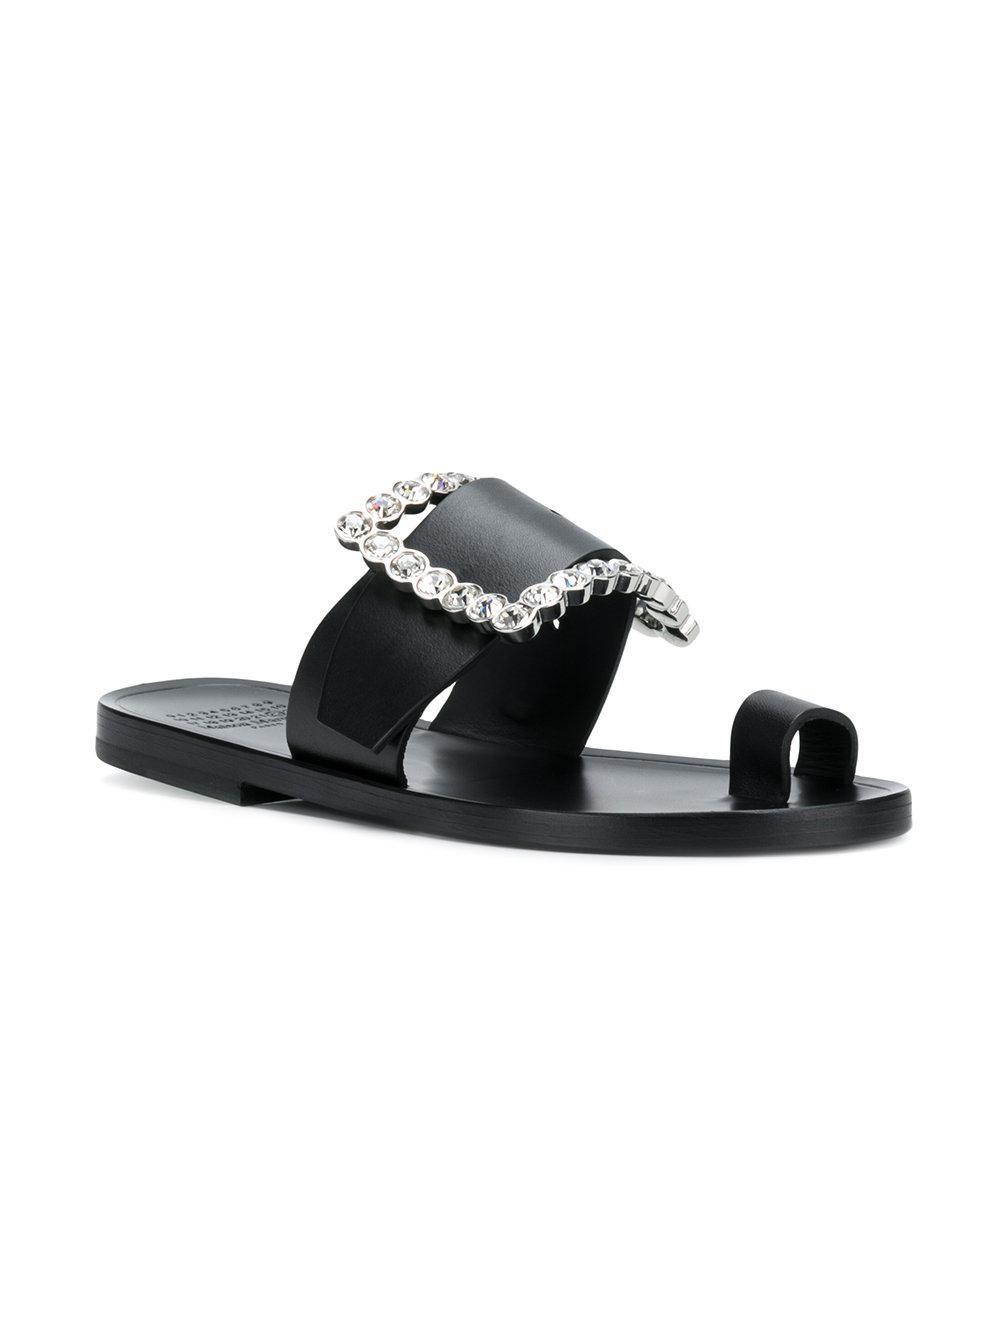 crystal buckle sandals - Black Maison Martin Margiela 35Ovk